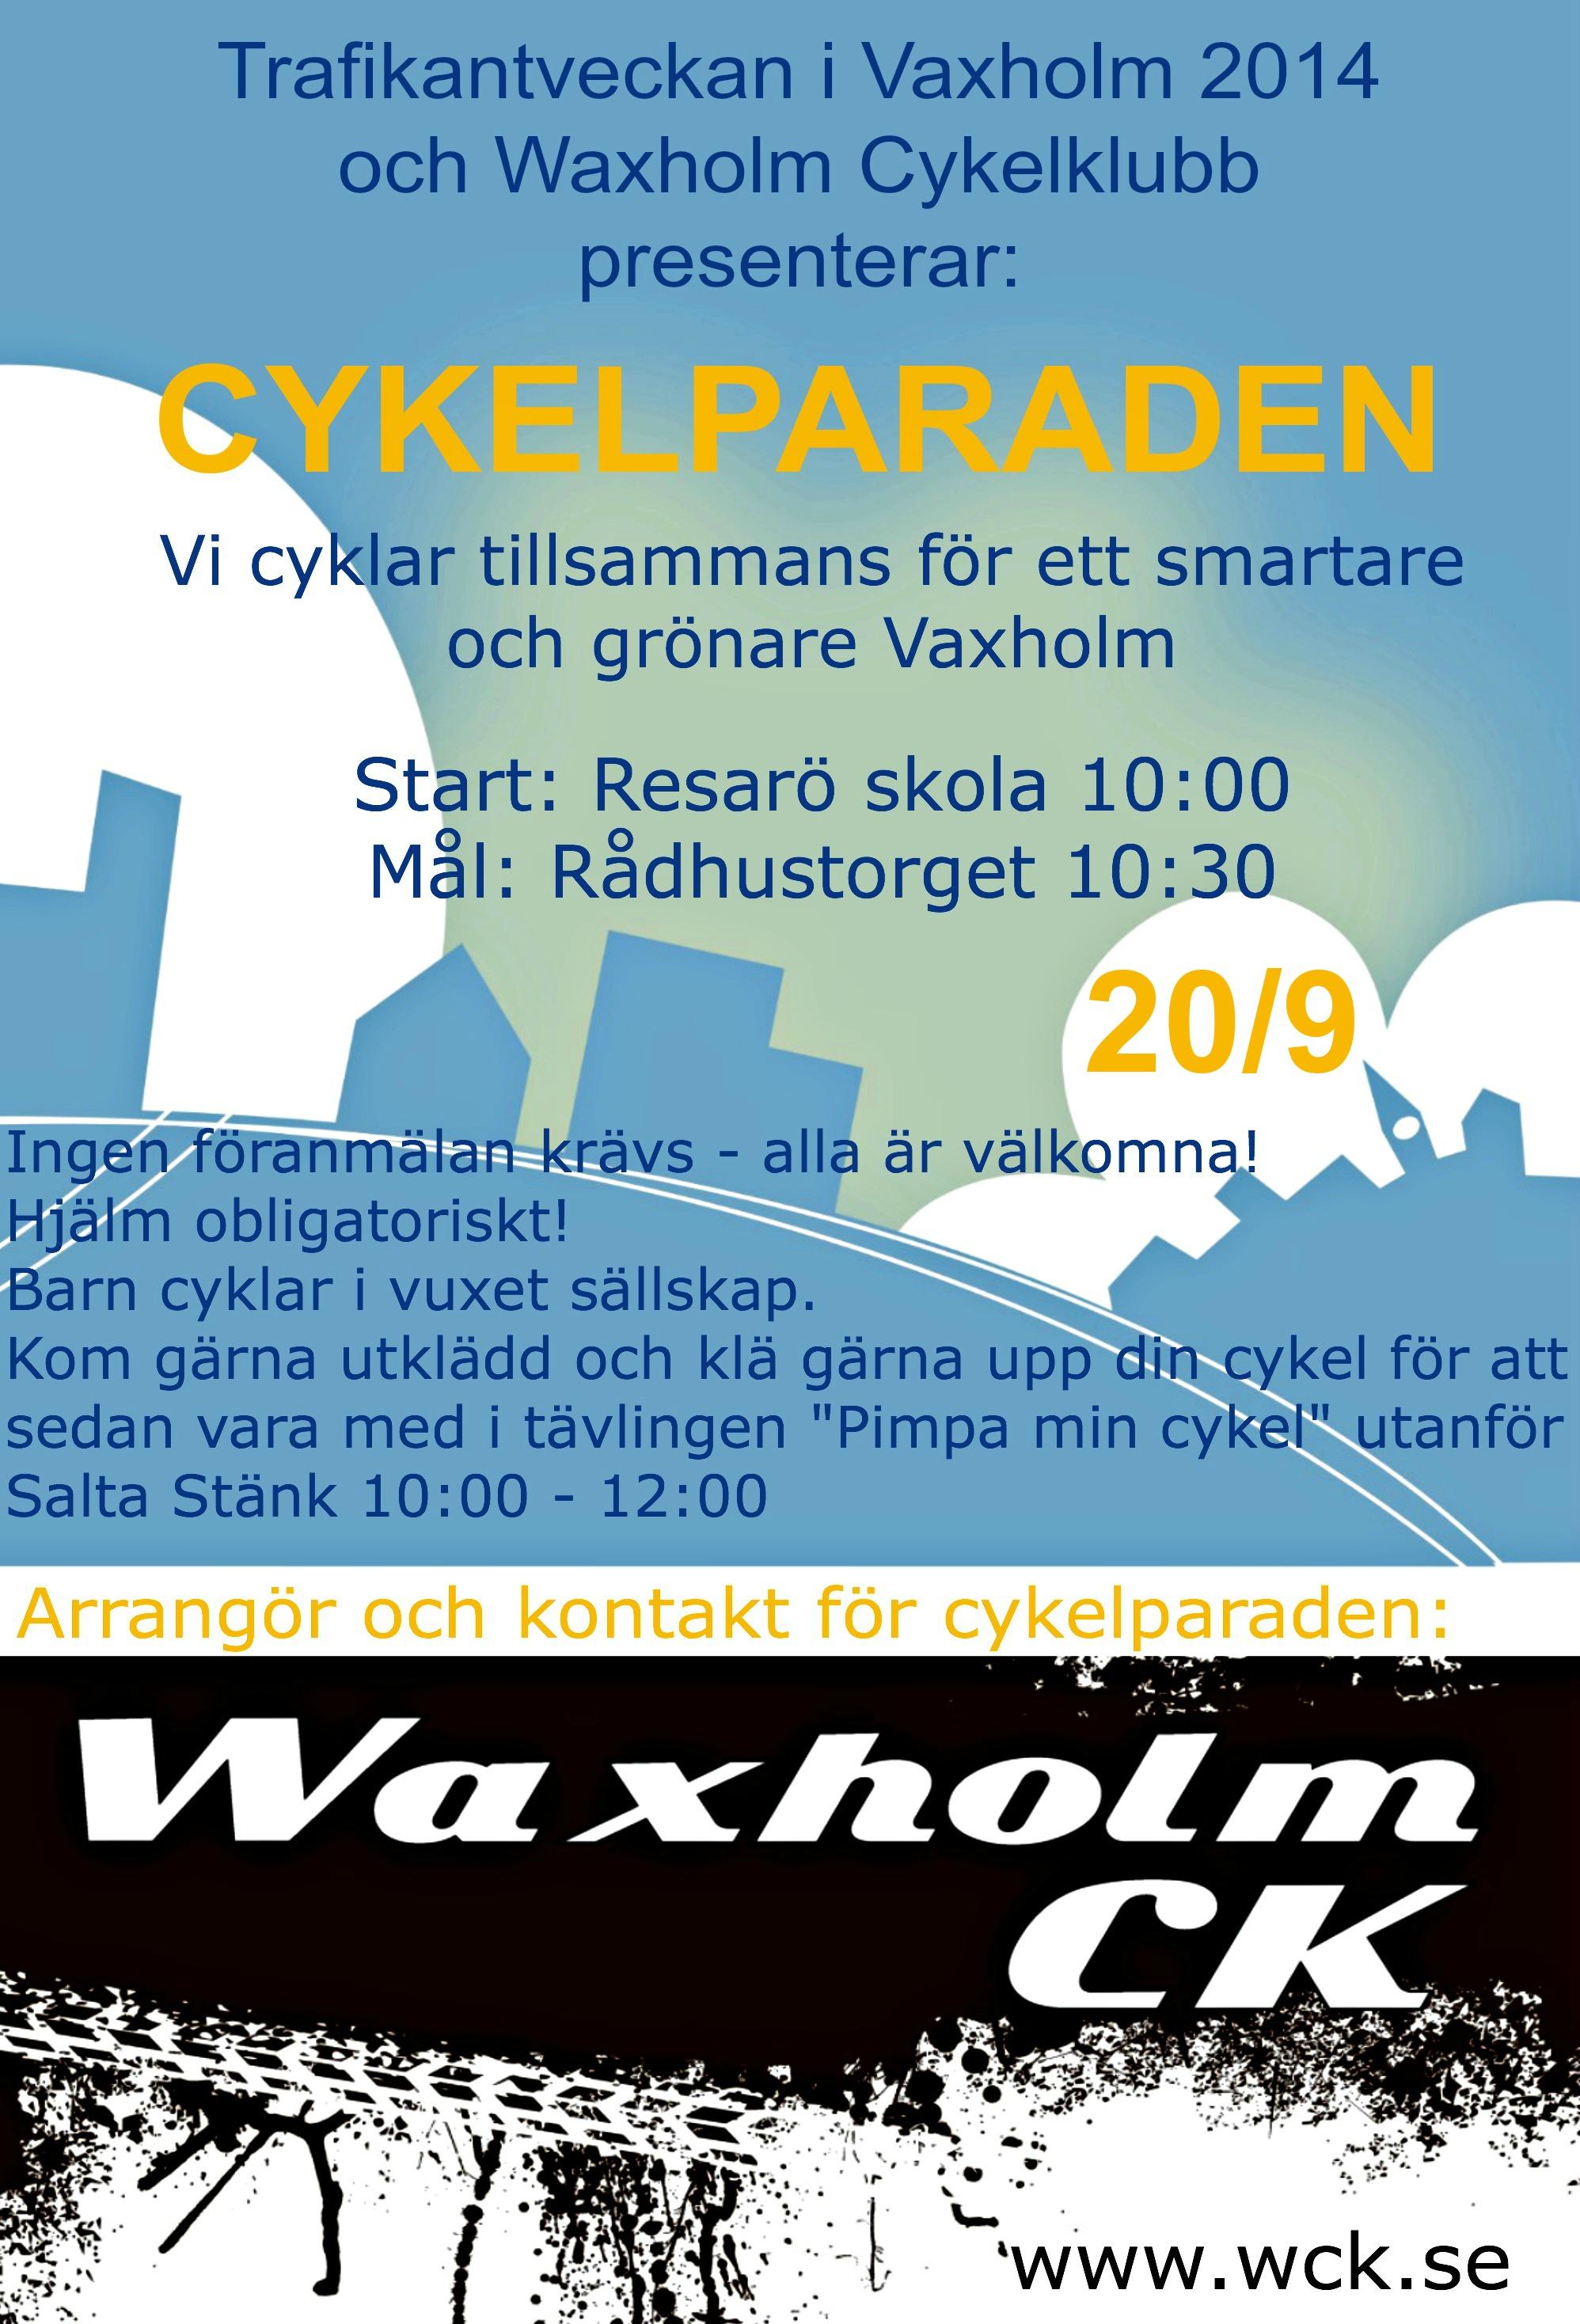 Cykelparaden - Trafikantveckan Vaxholm